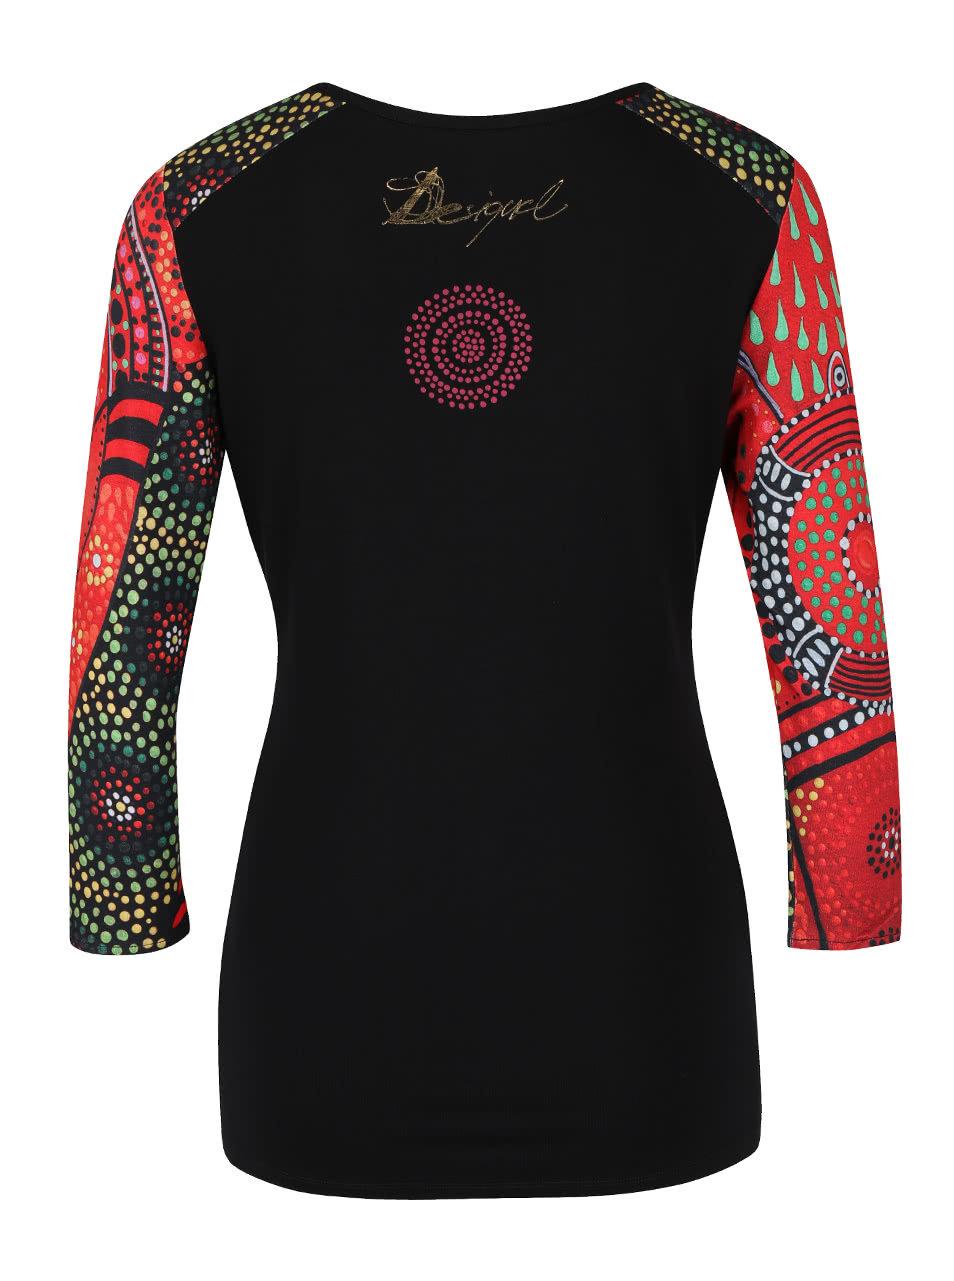 97f94a4d0c43 Čierne tričko s červenými 3 4 rukávmi Desigual Woman ...